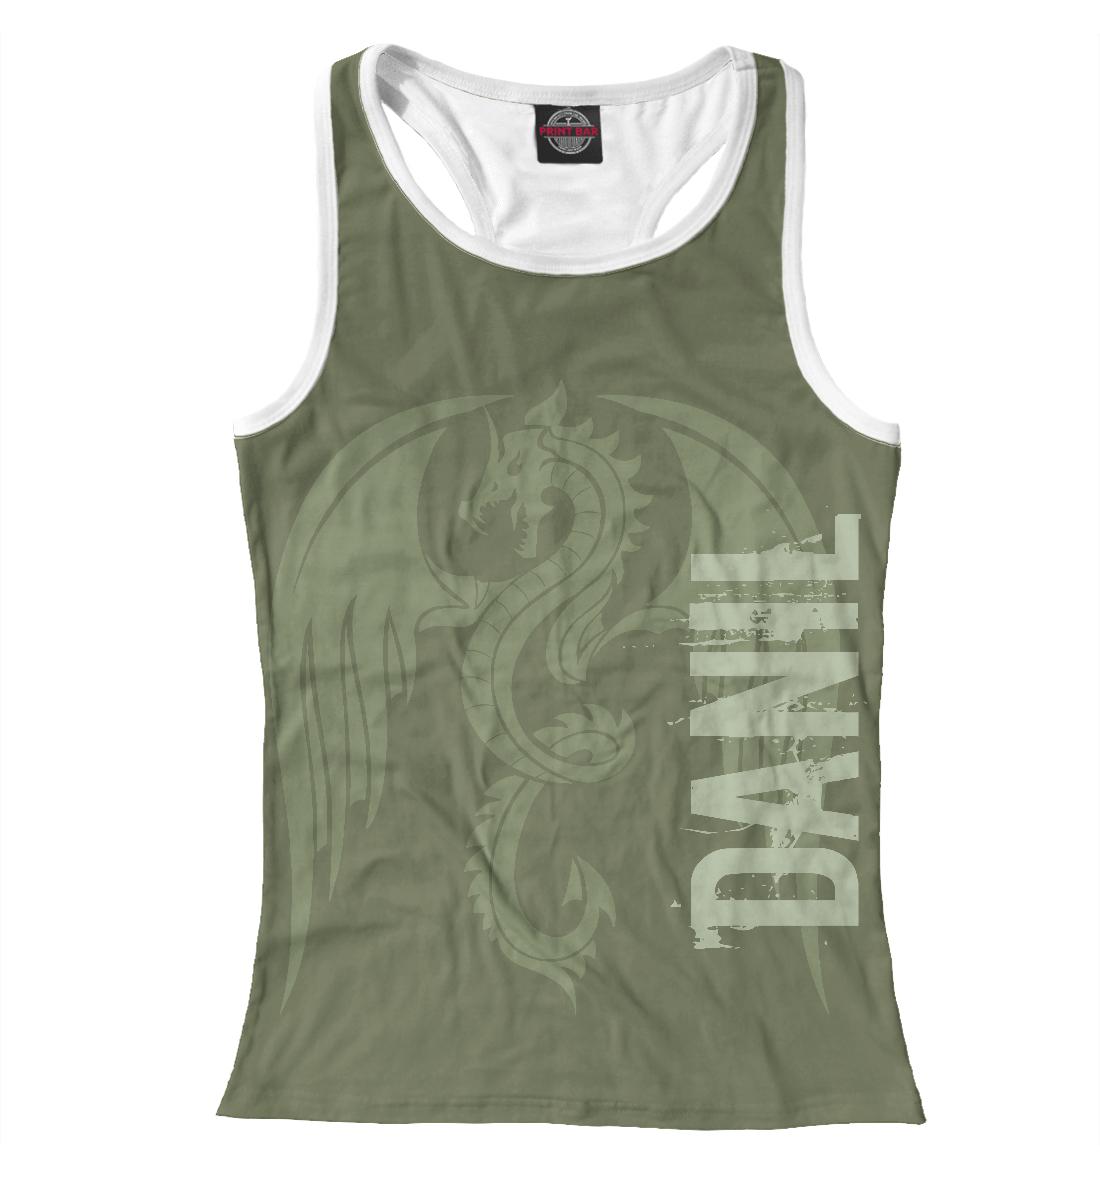 Купить Даниил и дракон, Printbar, Майки борцовки, DAN-974730-mayb-1